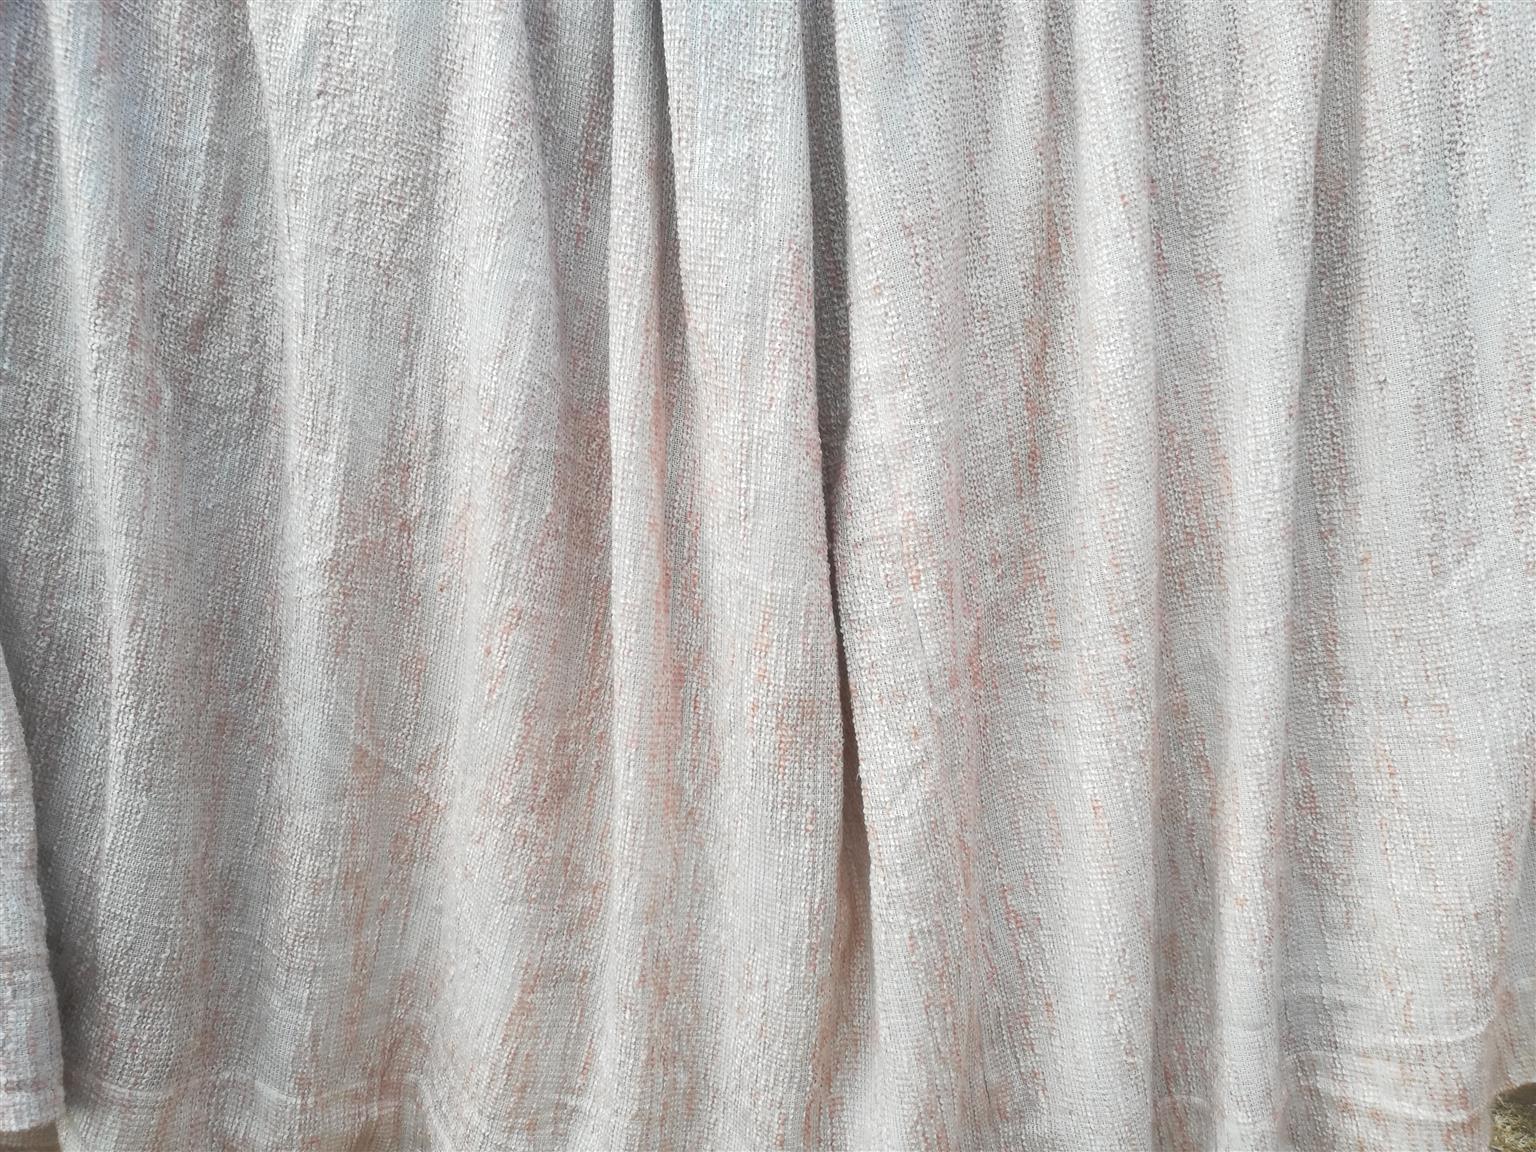 10 meters thick woollen curtains